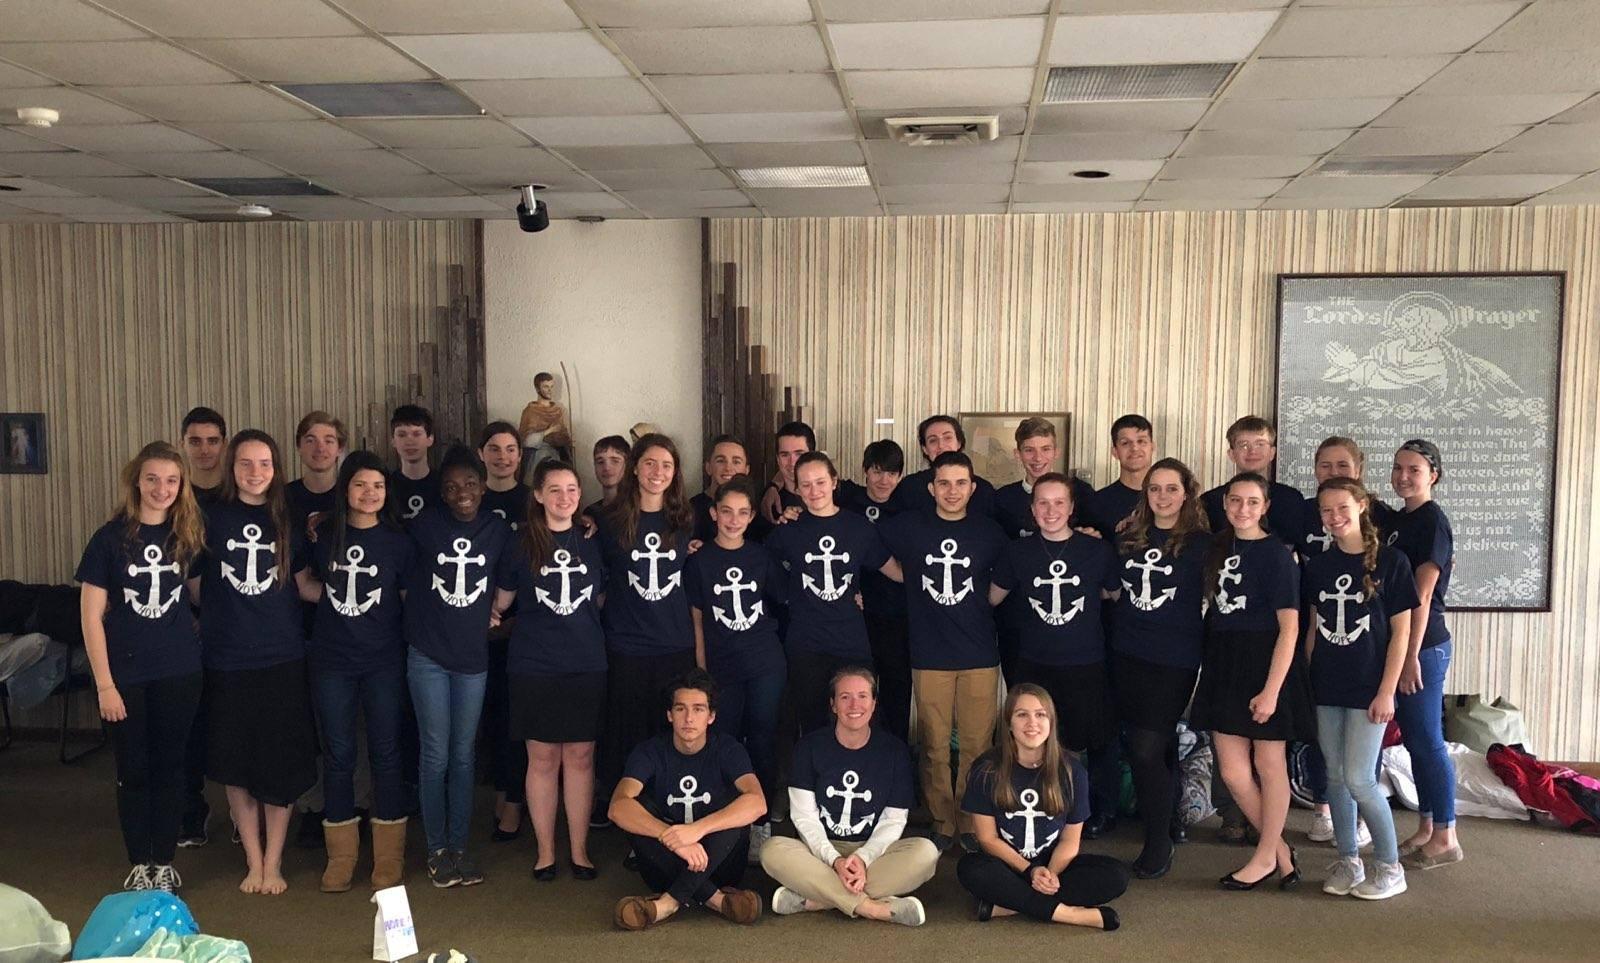 St. Magdalen's Youth Group Flemington, NJ   Spring retreat shirts.